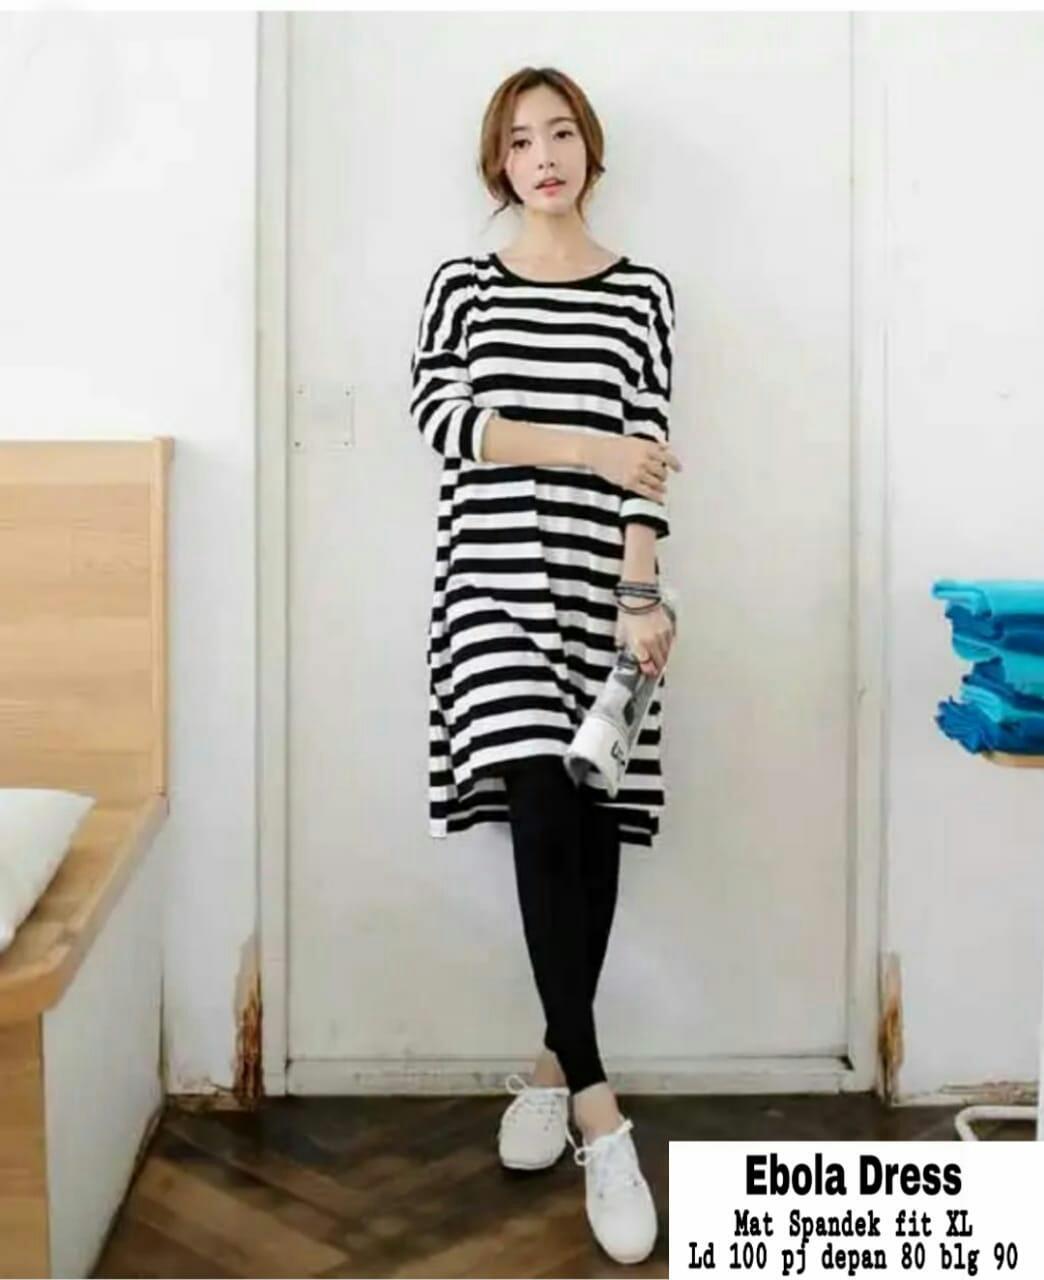 FJCO Ms Dress Ebola / Dress wanita / Fashion wanita